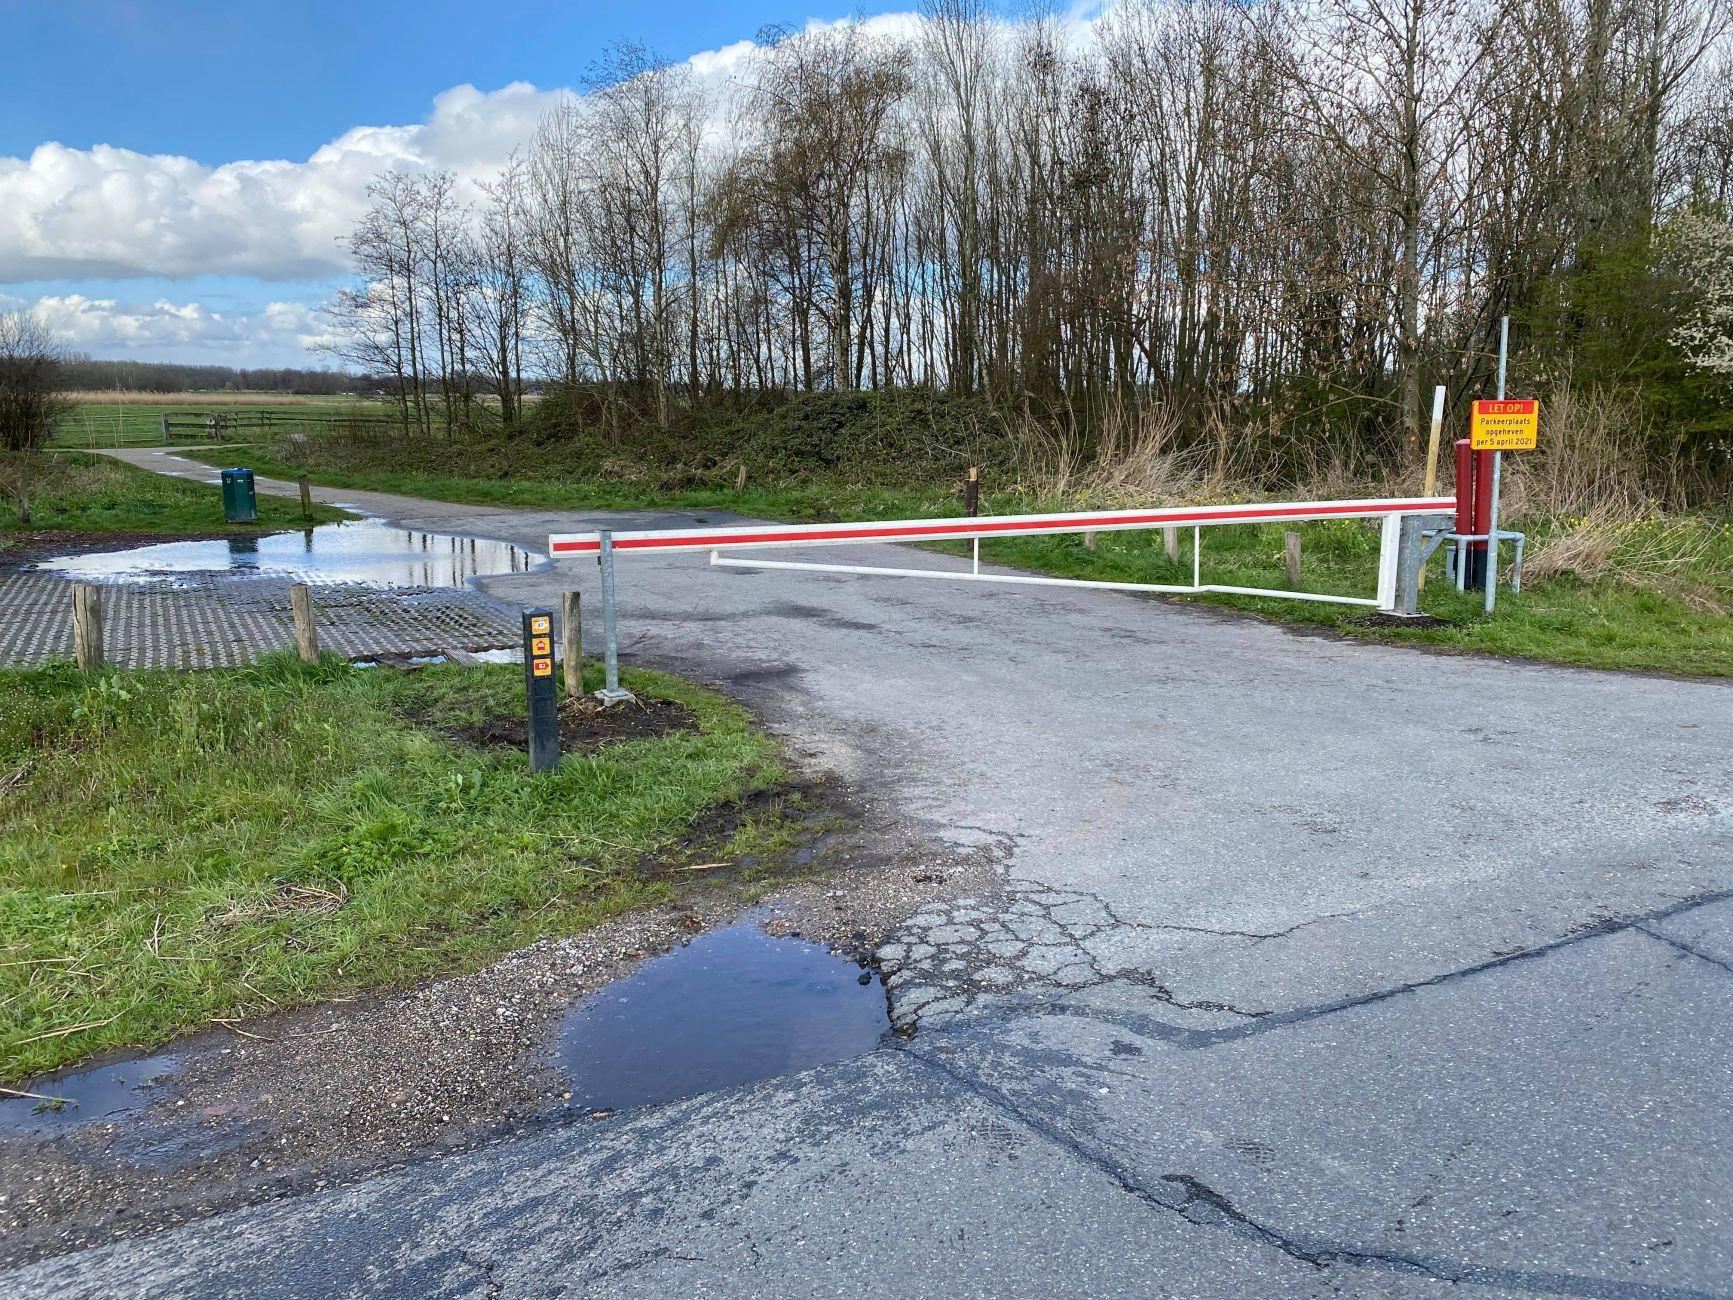 'Afsluiten parkeerplaats Breeweg is zwaktebod'